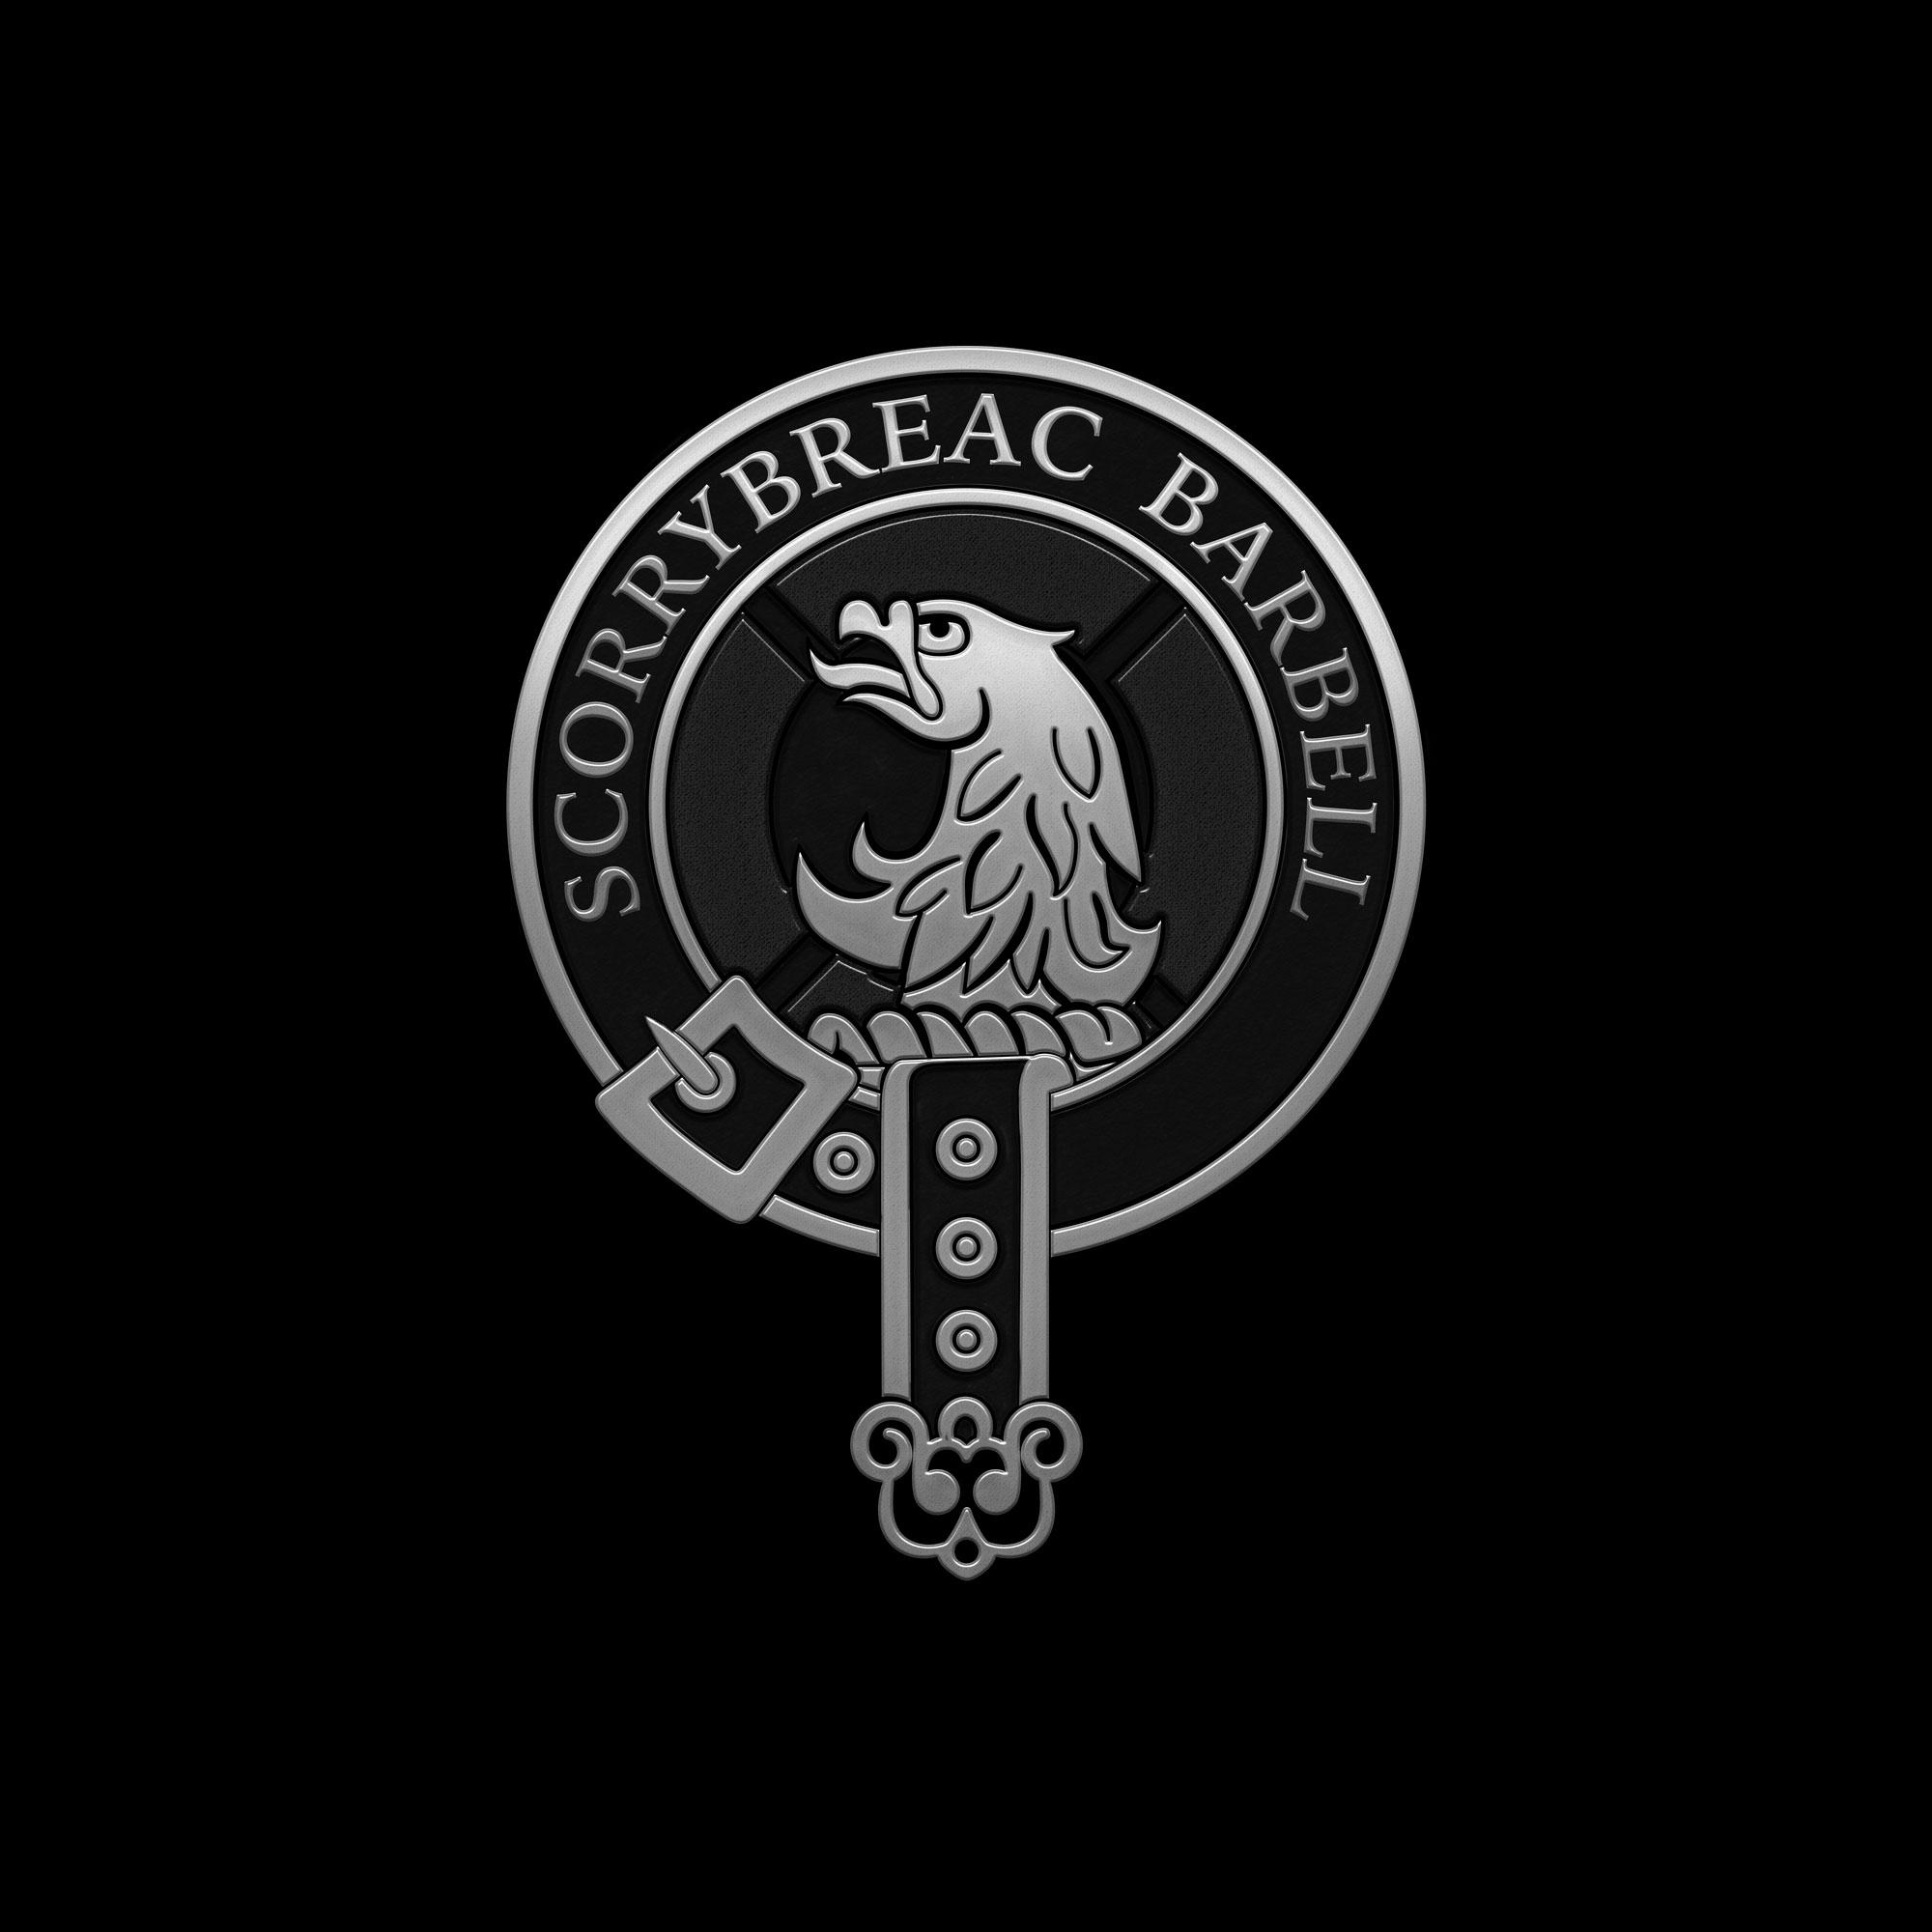 ScorrybreacBarbell Logo Primary Grey Black